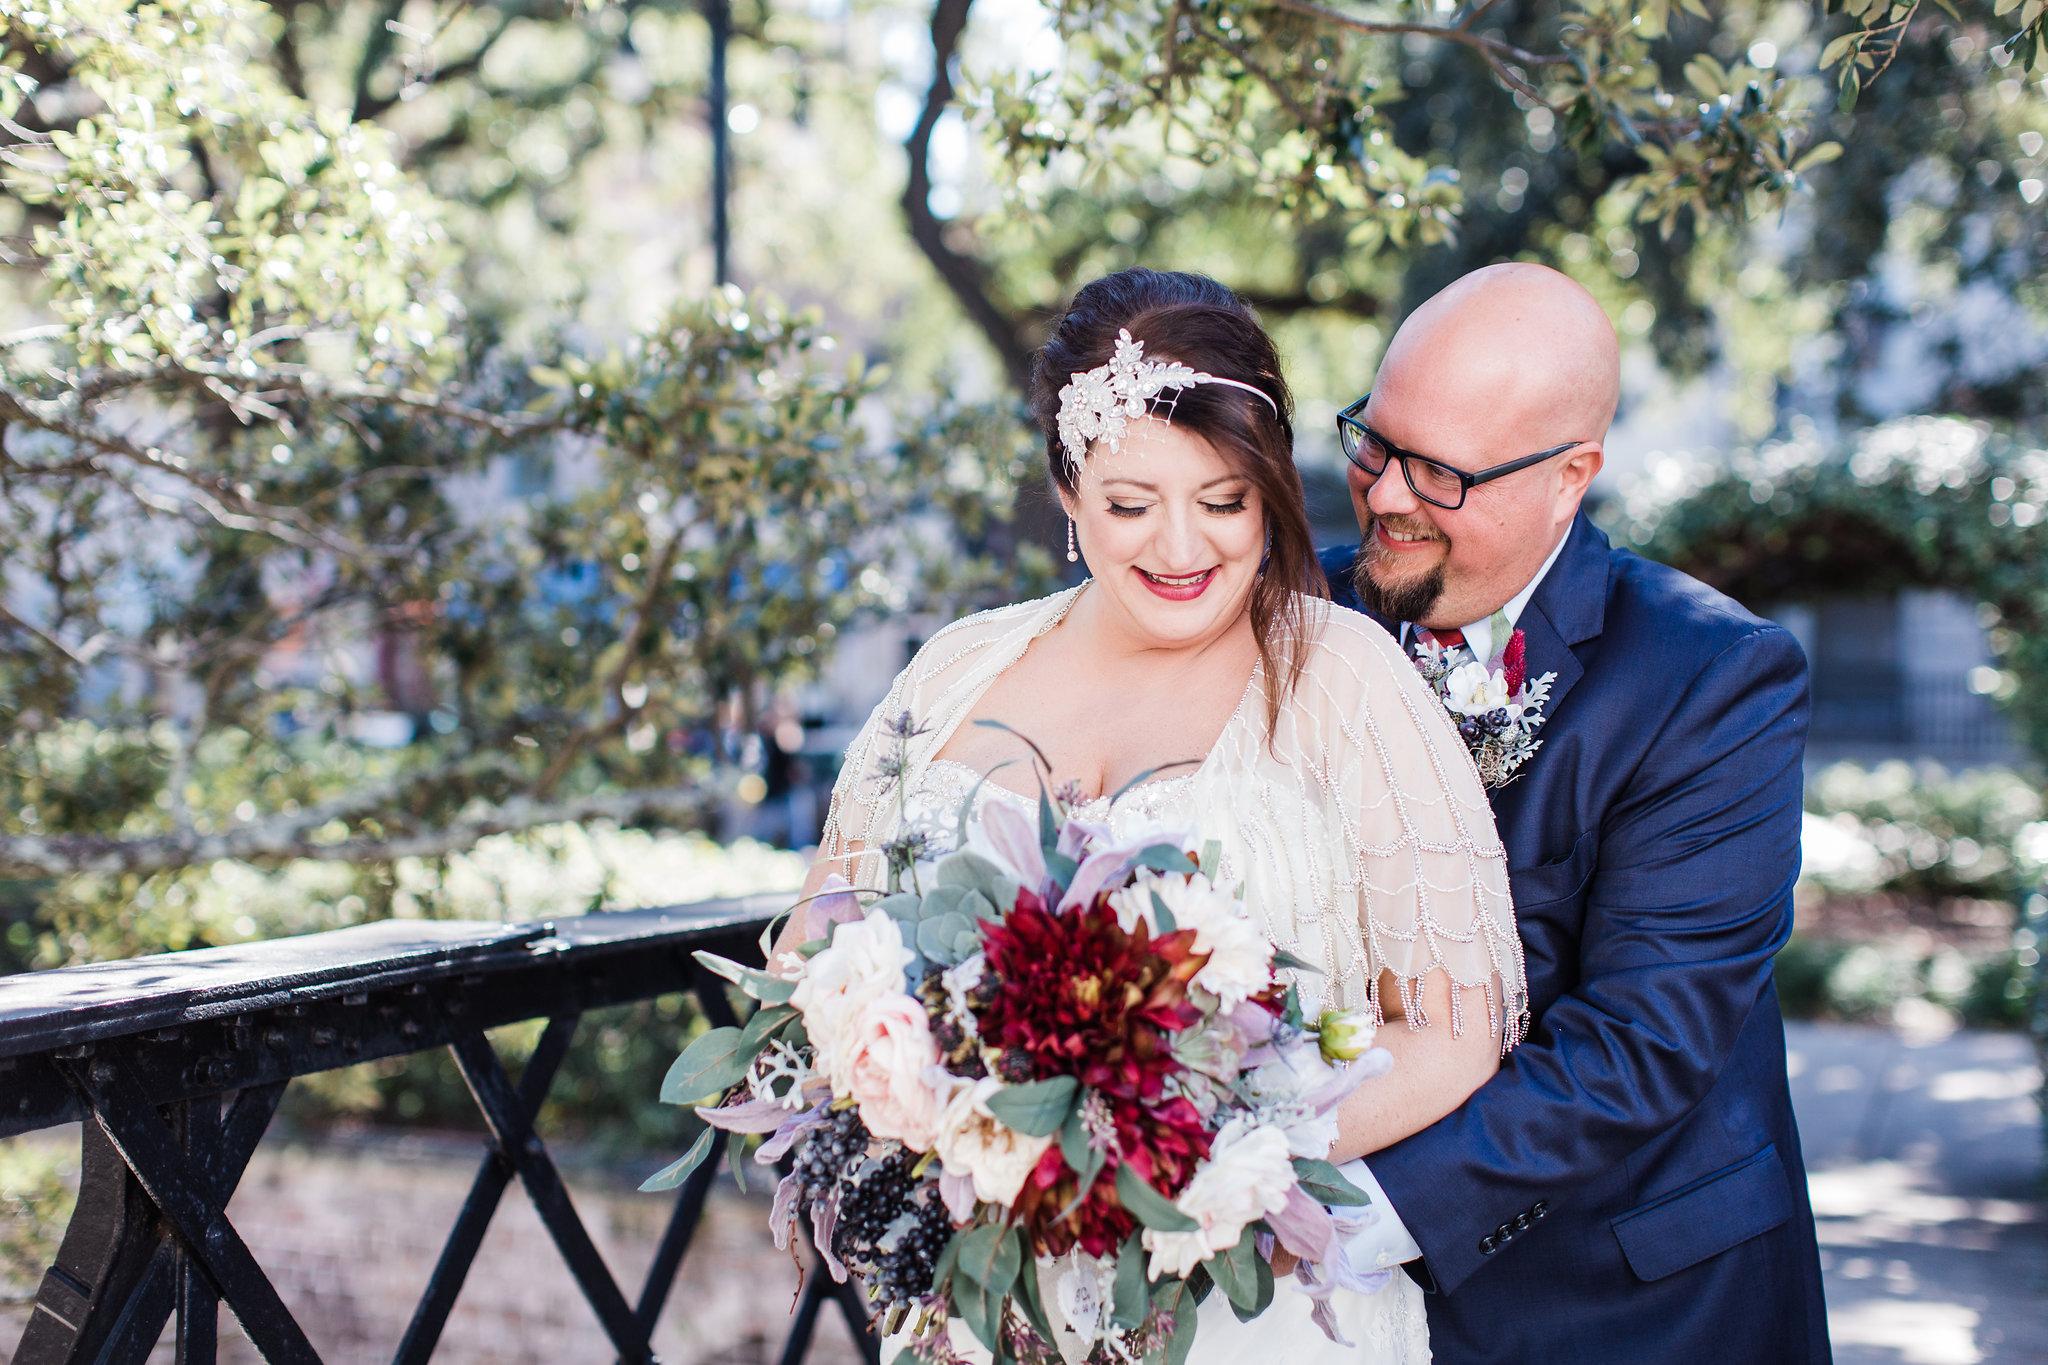 apt-b-photography-kristy-rob-wormsloe-elopment-savannah-wedding-photographer-savannah-elopement-wormsloe-wedding-historic-savannah-11.jpg